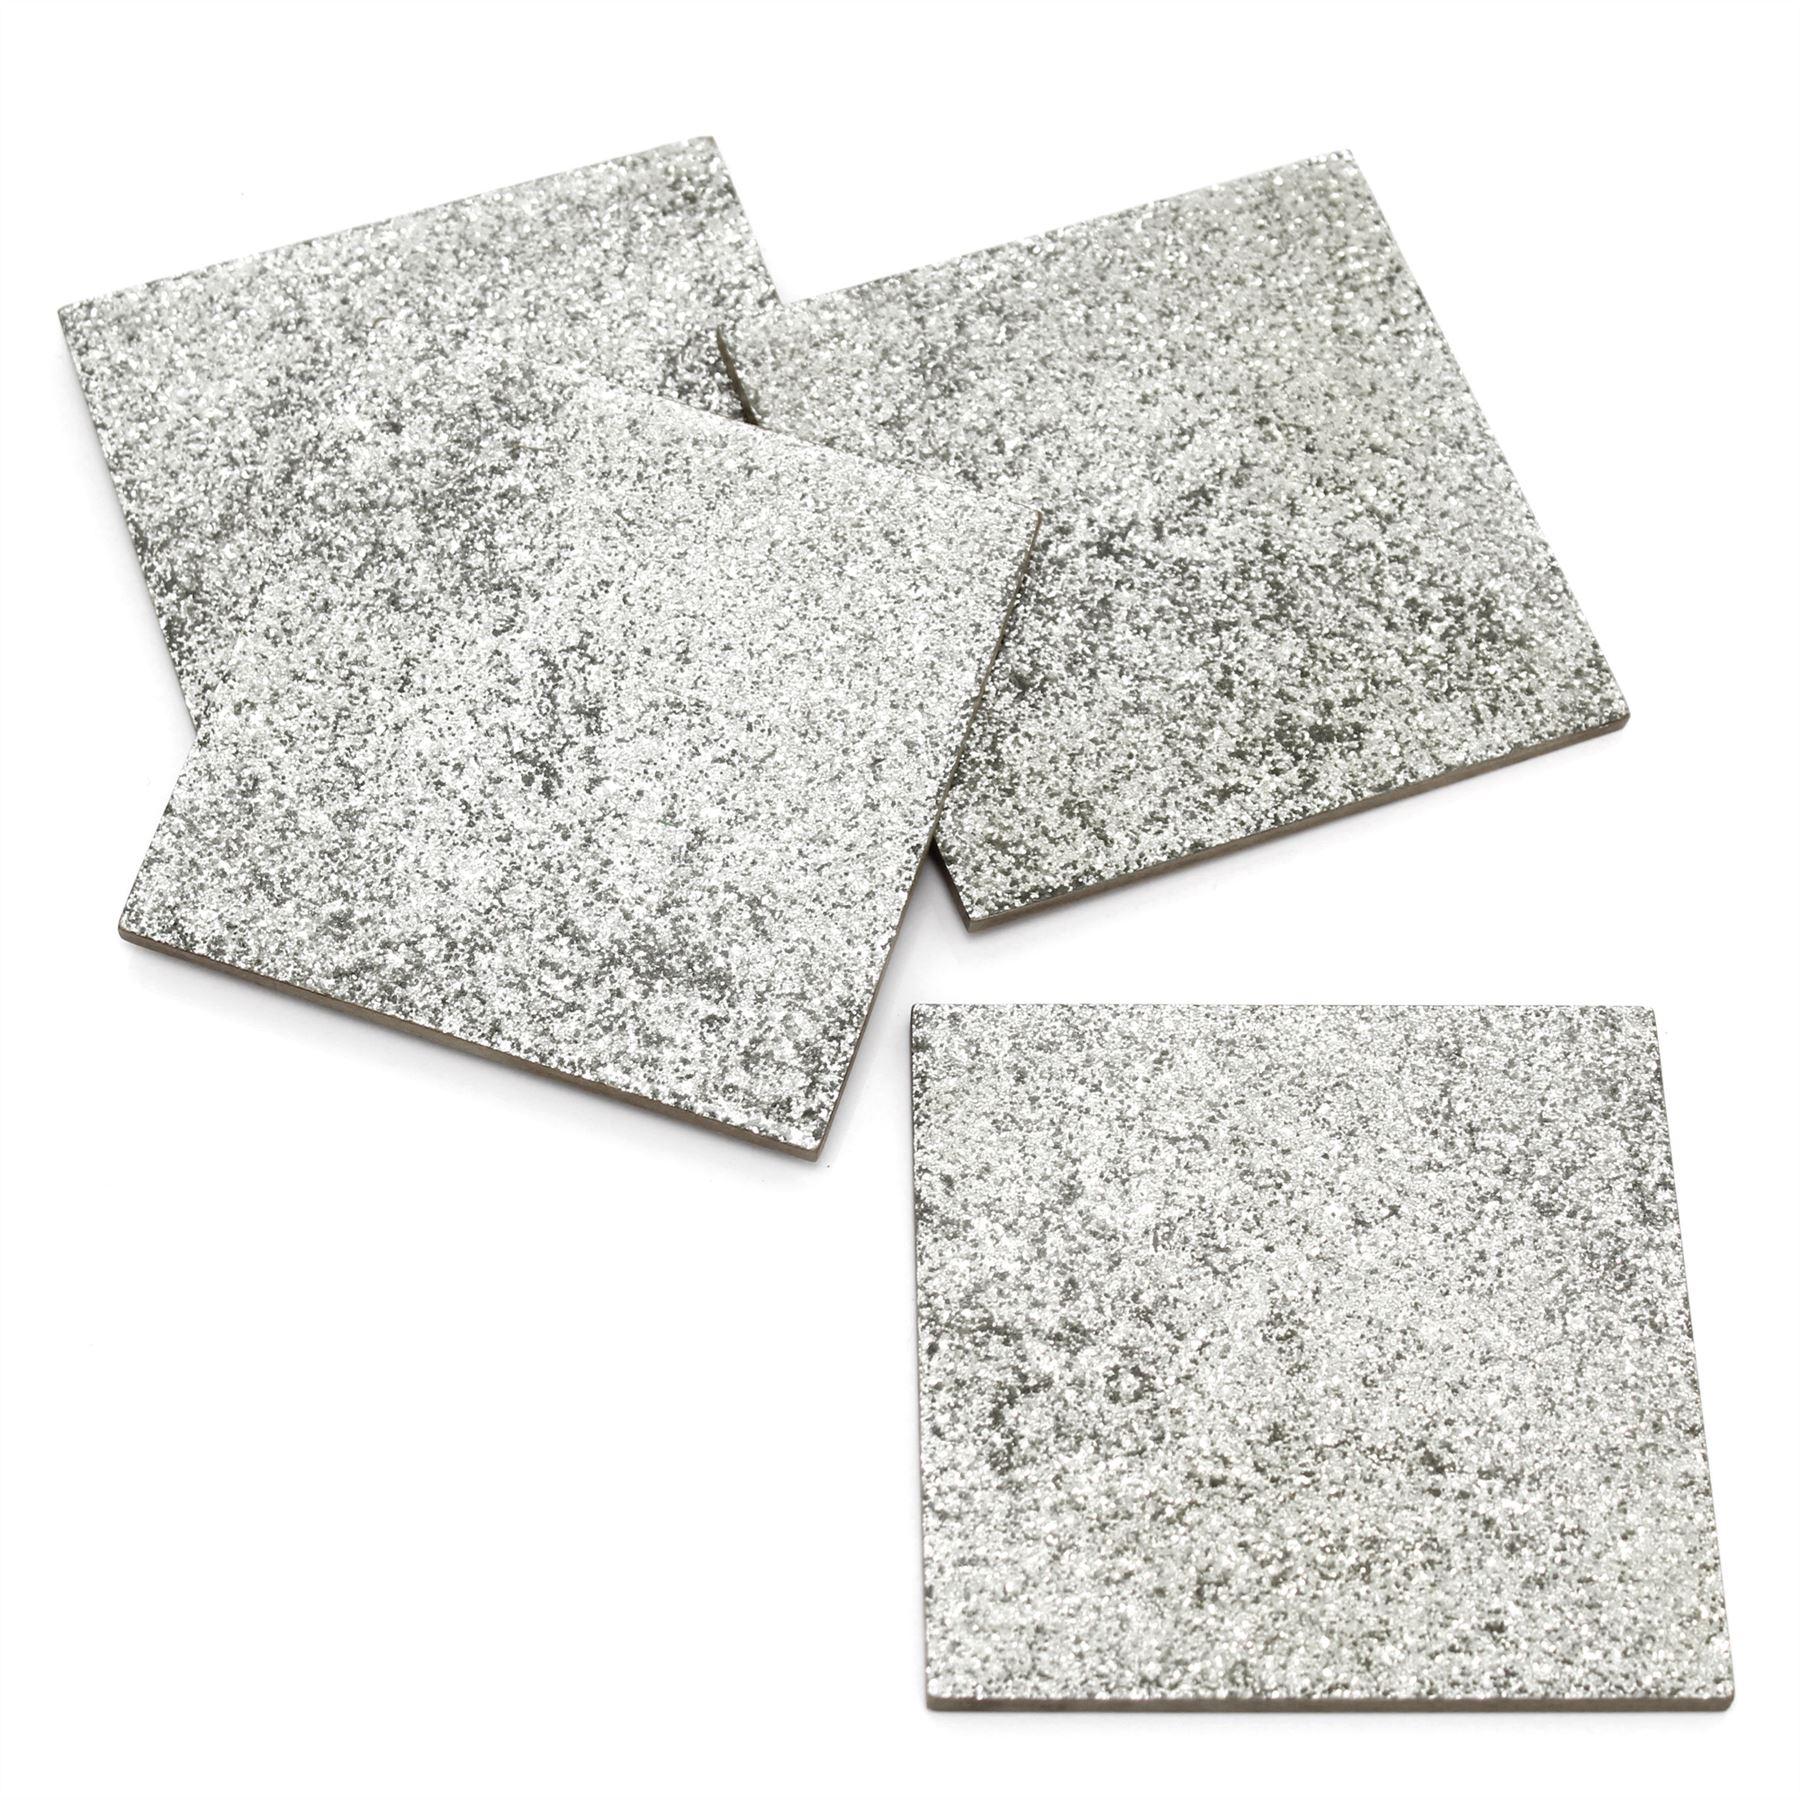 charms antique silver tone M653 BULK 50 Camp rocks